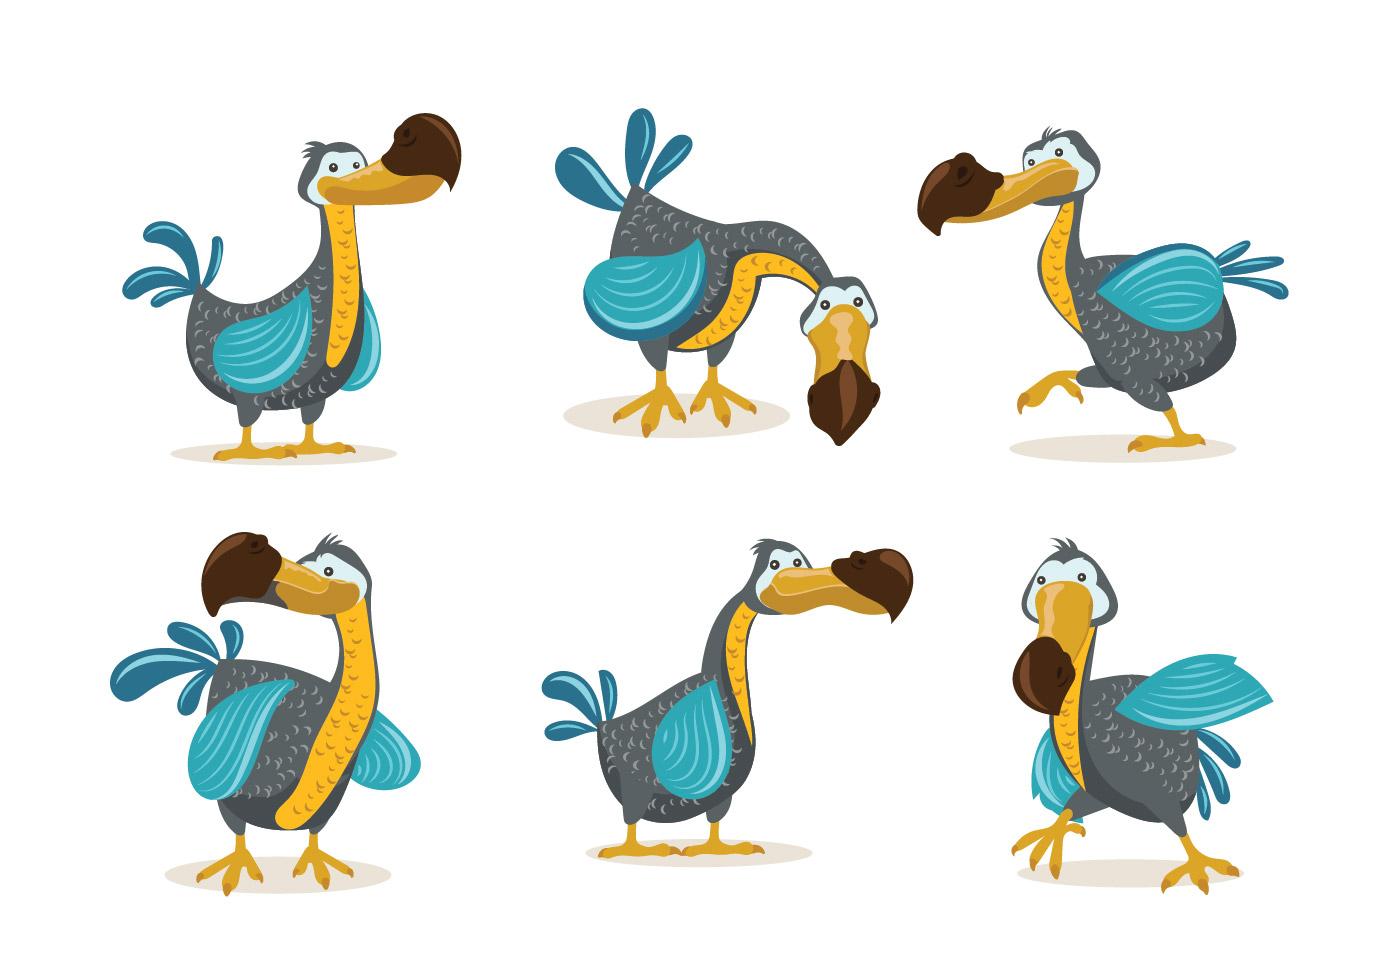 1400x980 Dodo Bird Illustration Cartoon Style